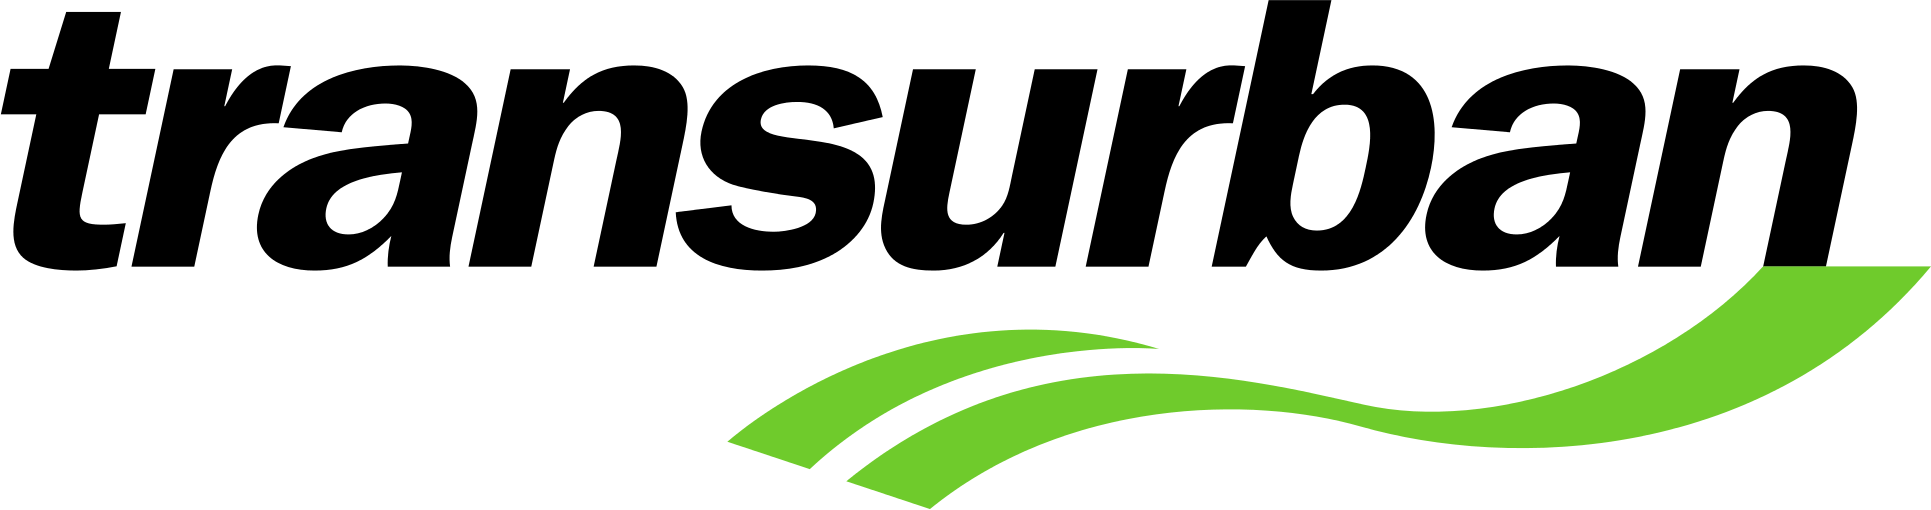 Transurban Group (ASX:TCL) Company Logo